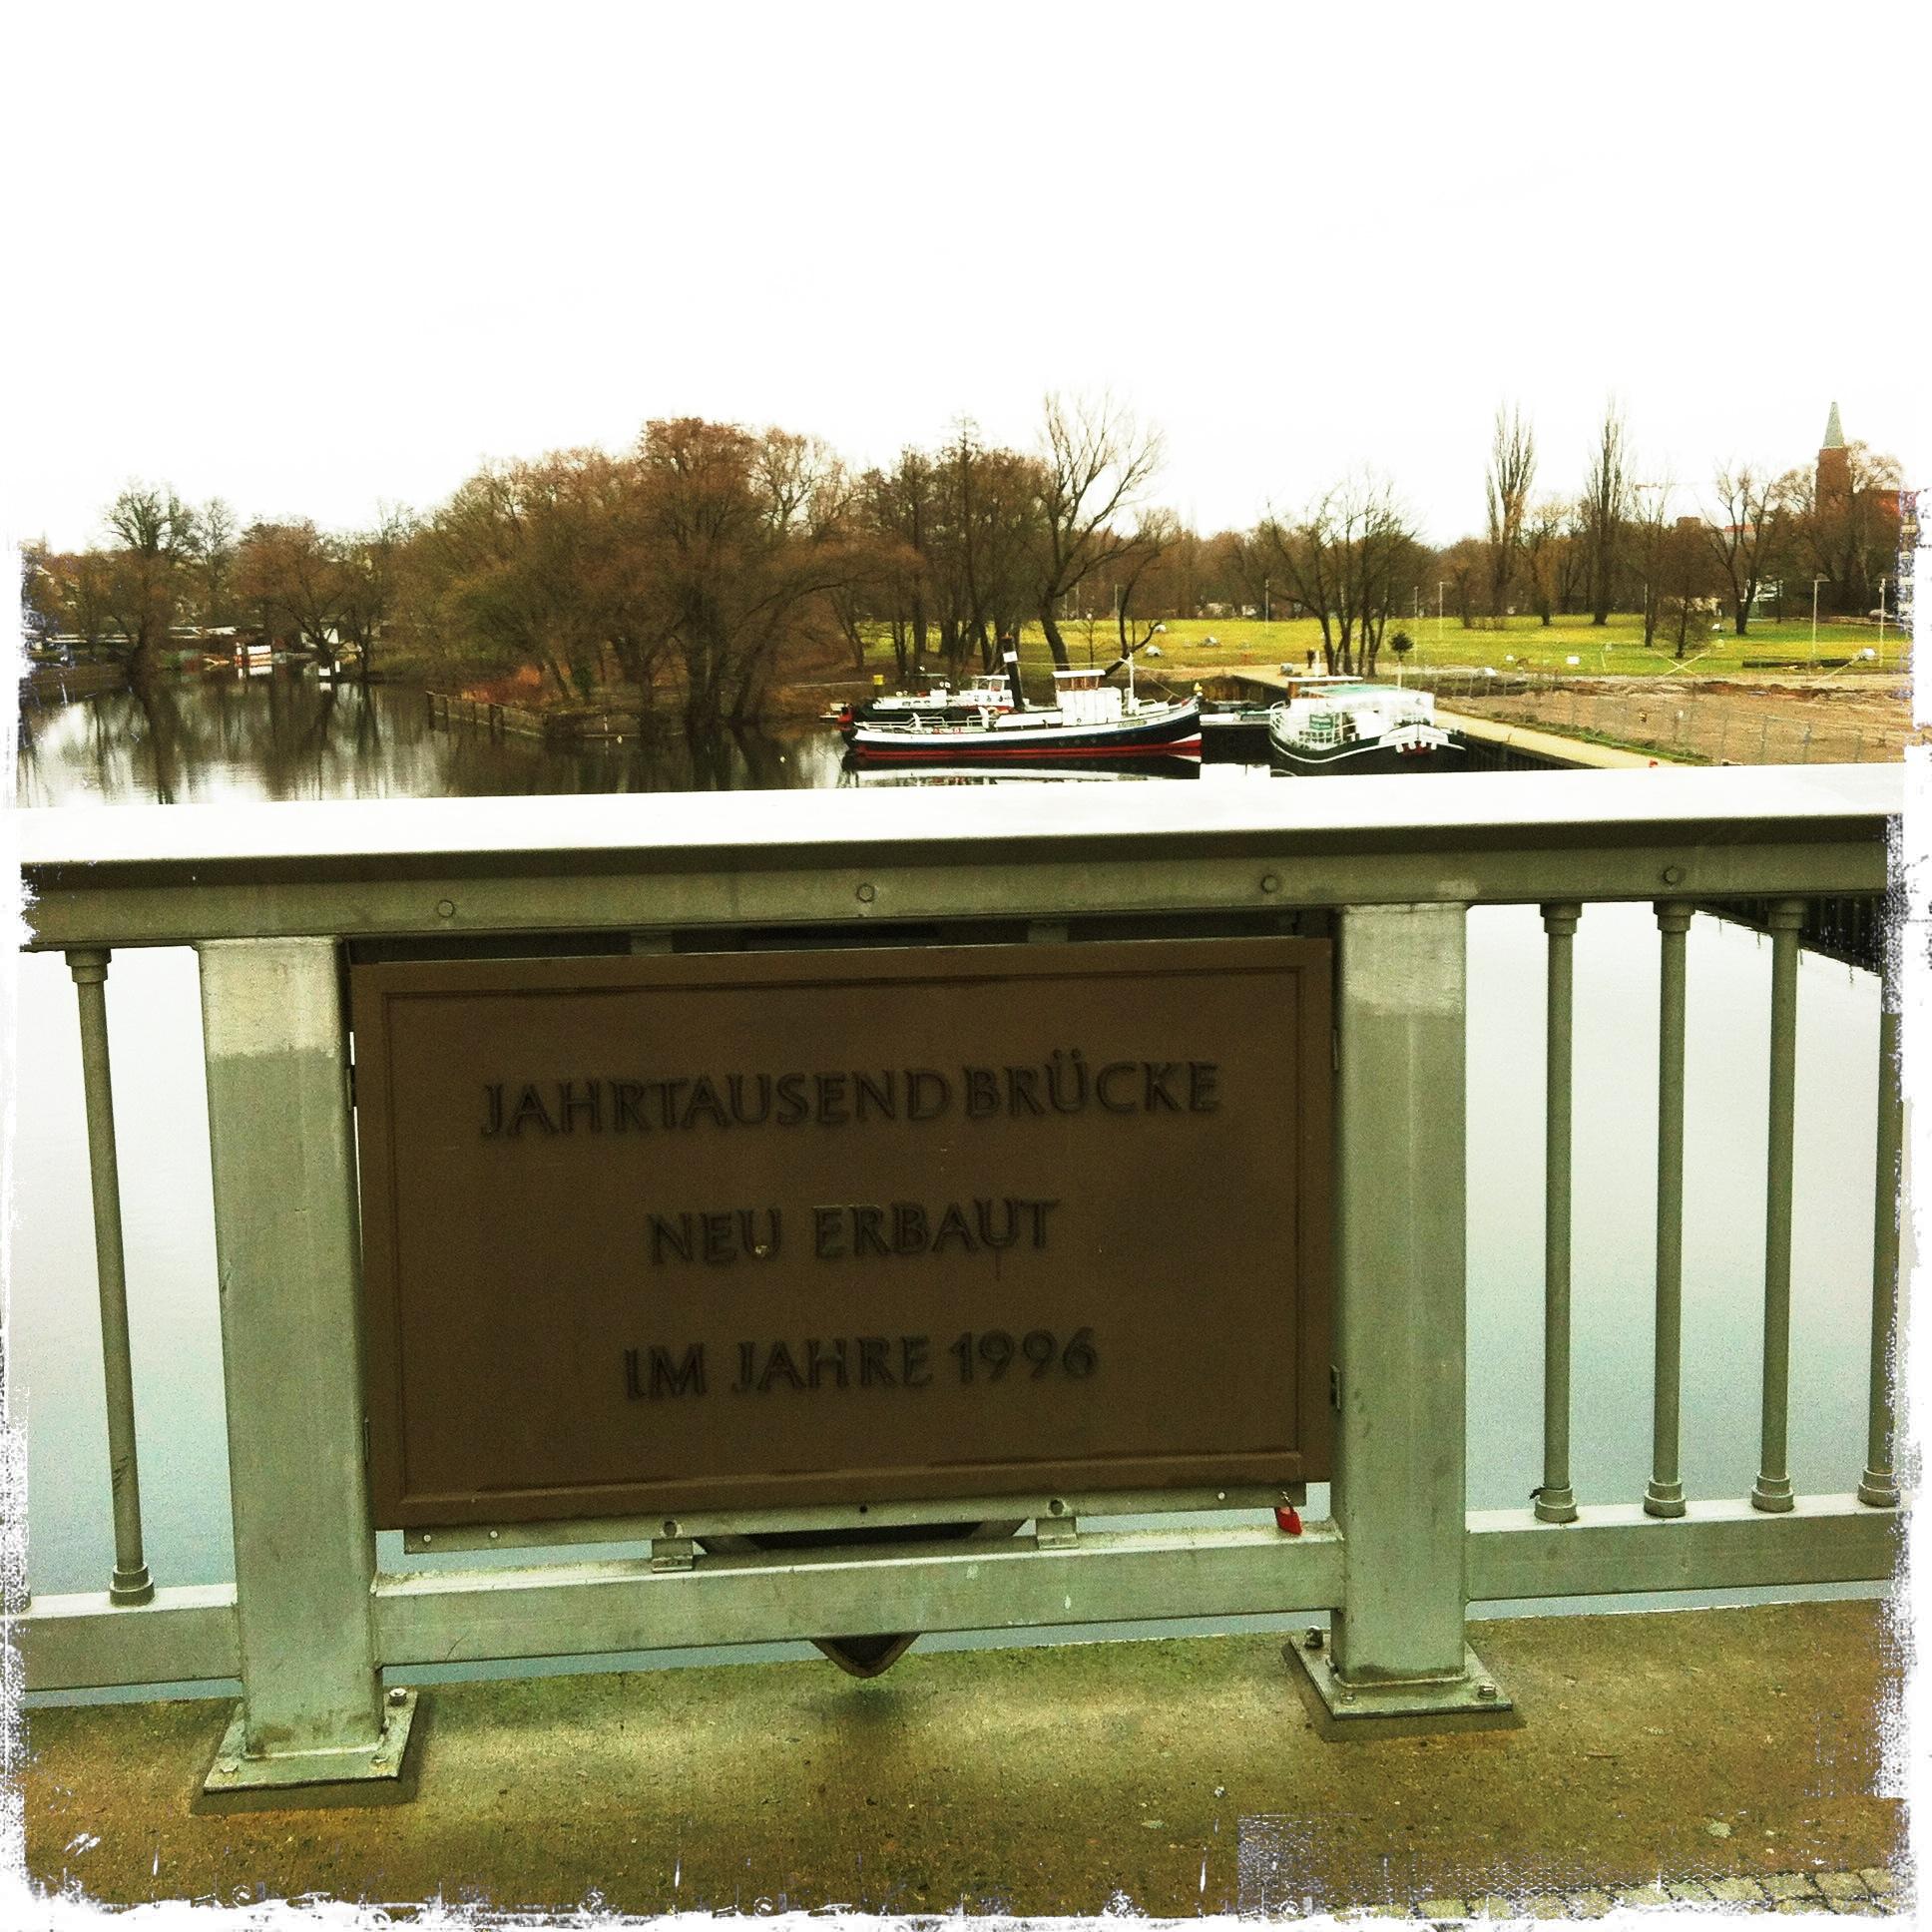 Brandenburg an der Havel l Jahrhundert Brücke